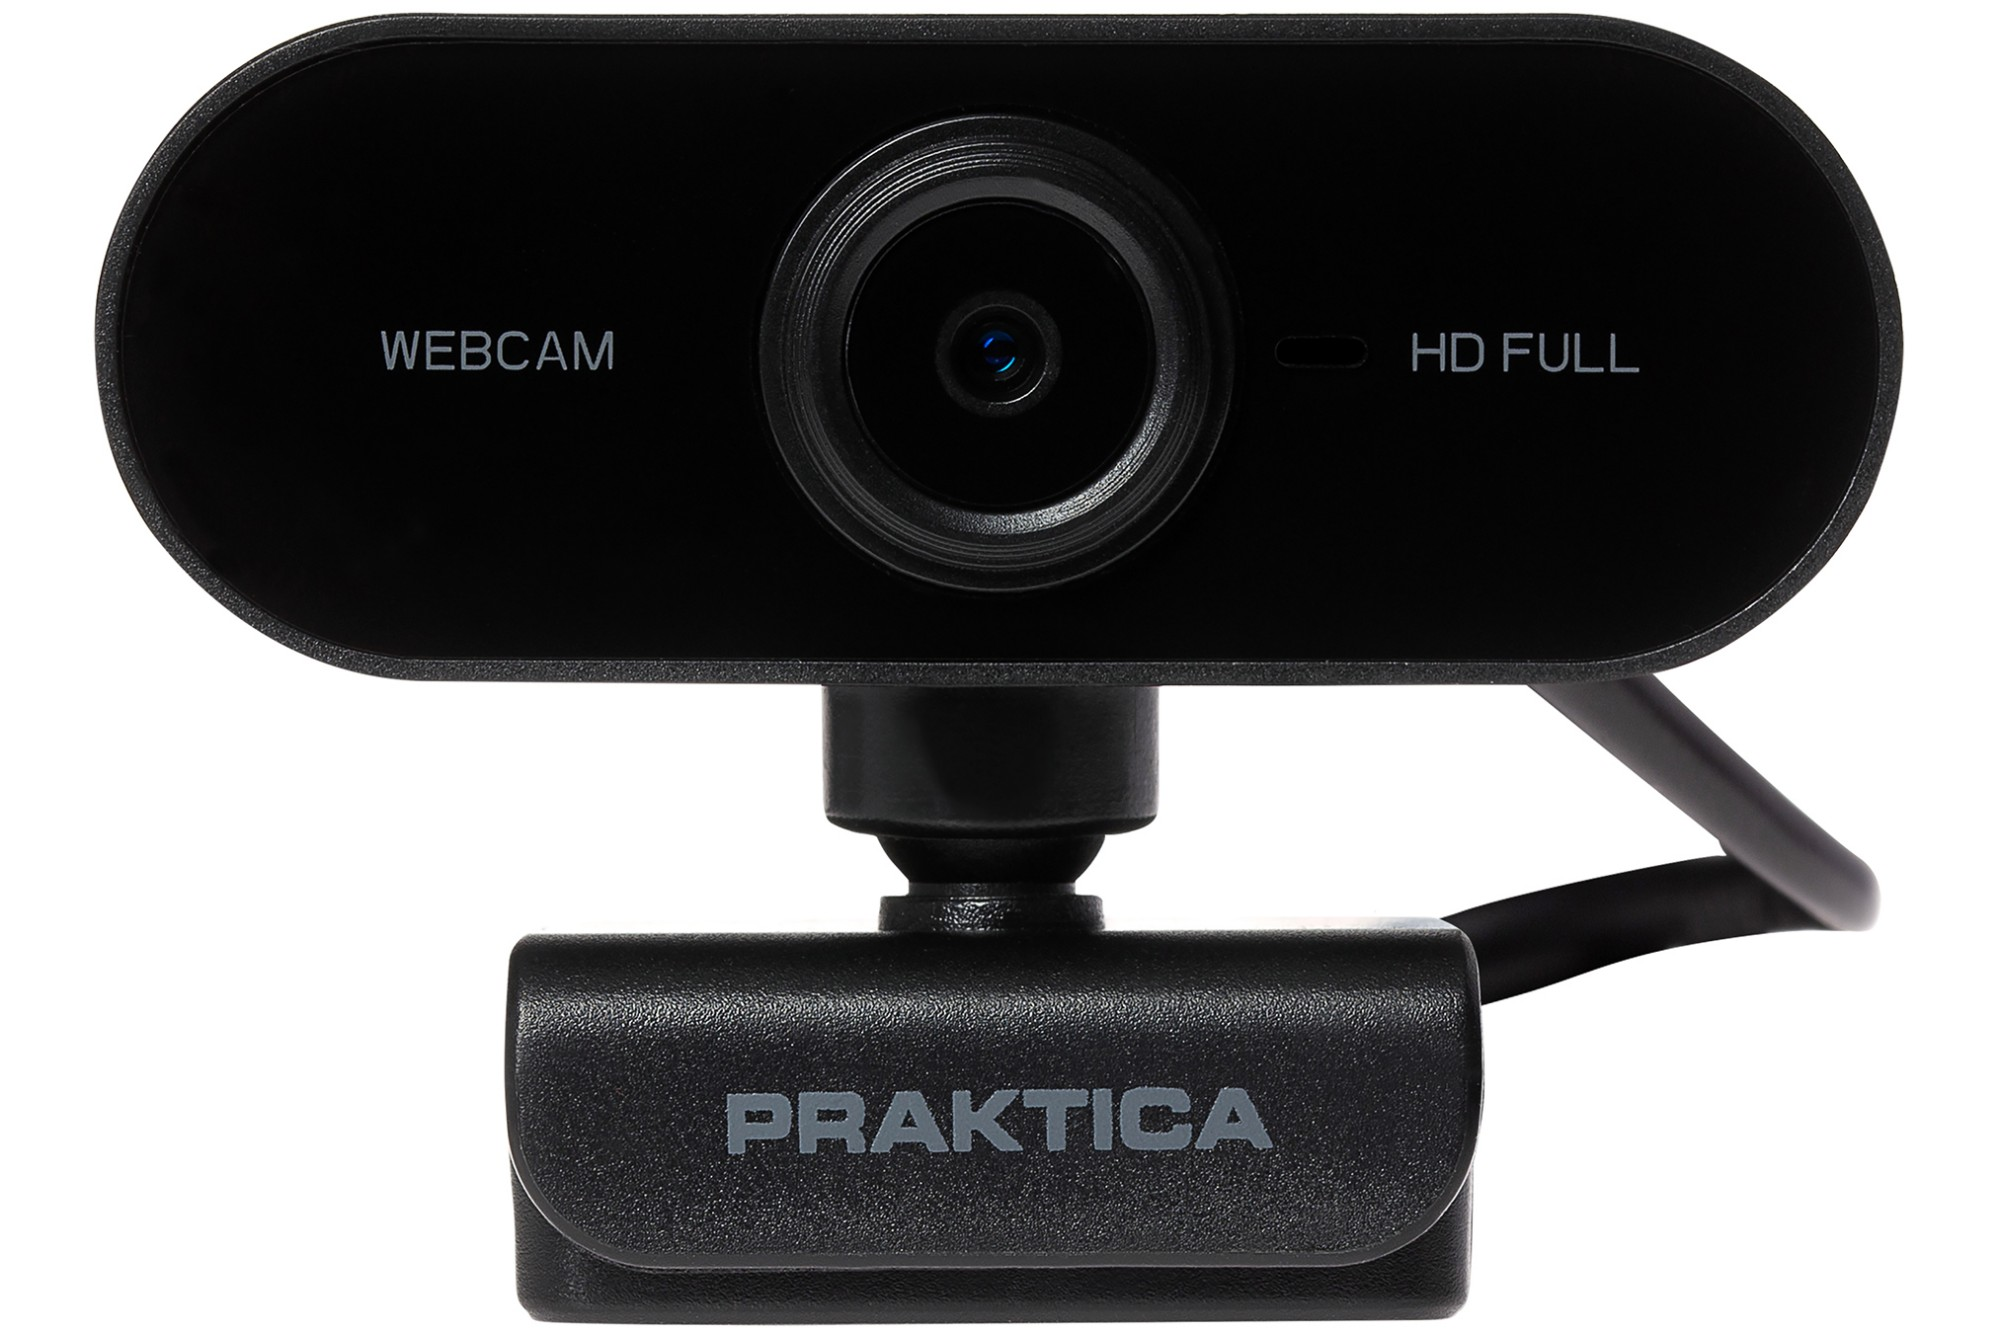 Praktica Webcam Full HD Auto Focus USB-A Built in Microphone and Tripod Mount